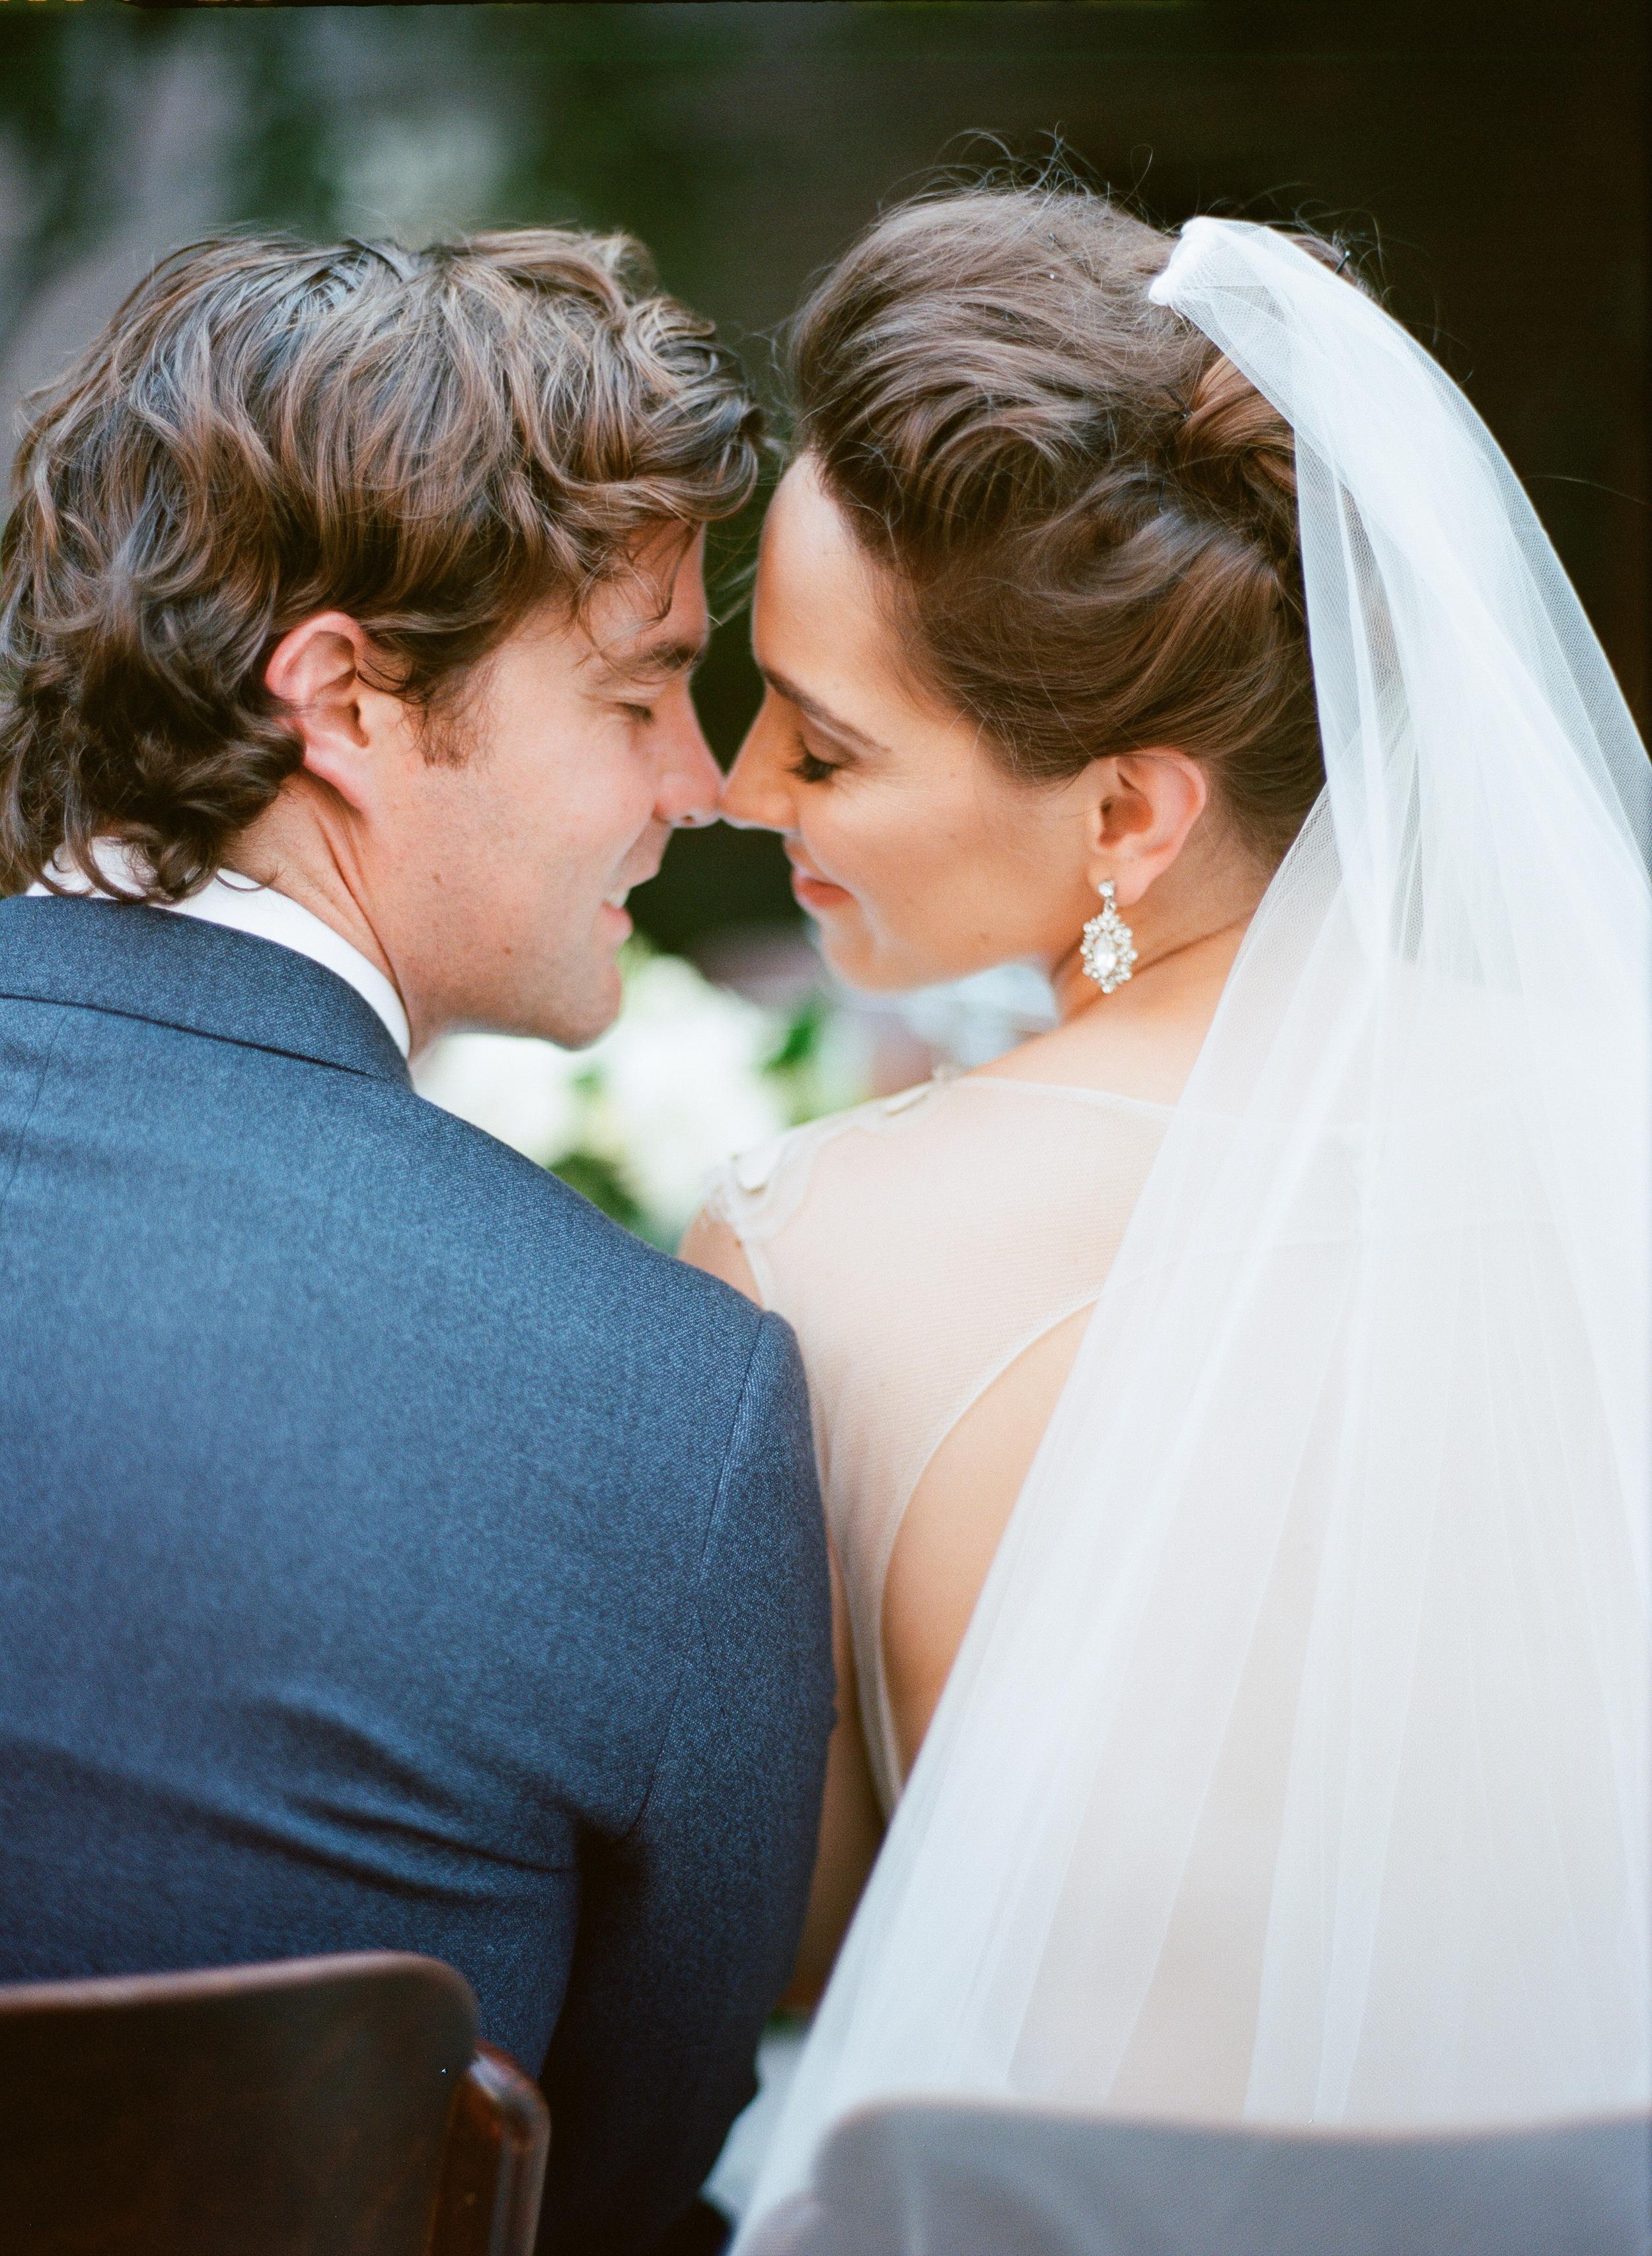 hannah_shih_hanaluluco_cj_isaac_charlie_juliet_ombre_chambray_prospect_park_brooklyn_wedding_46.jpg